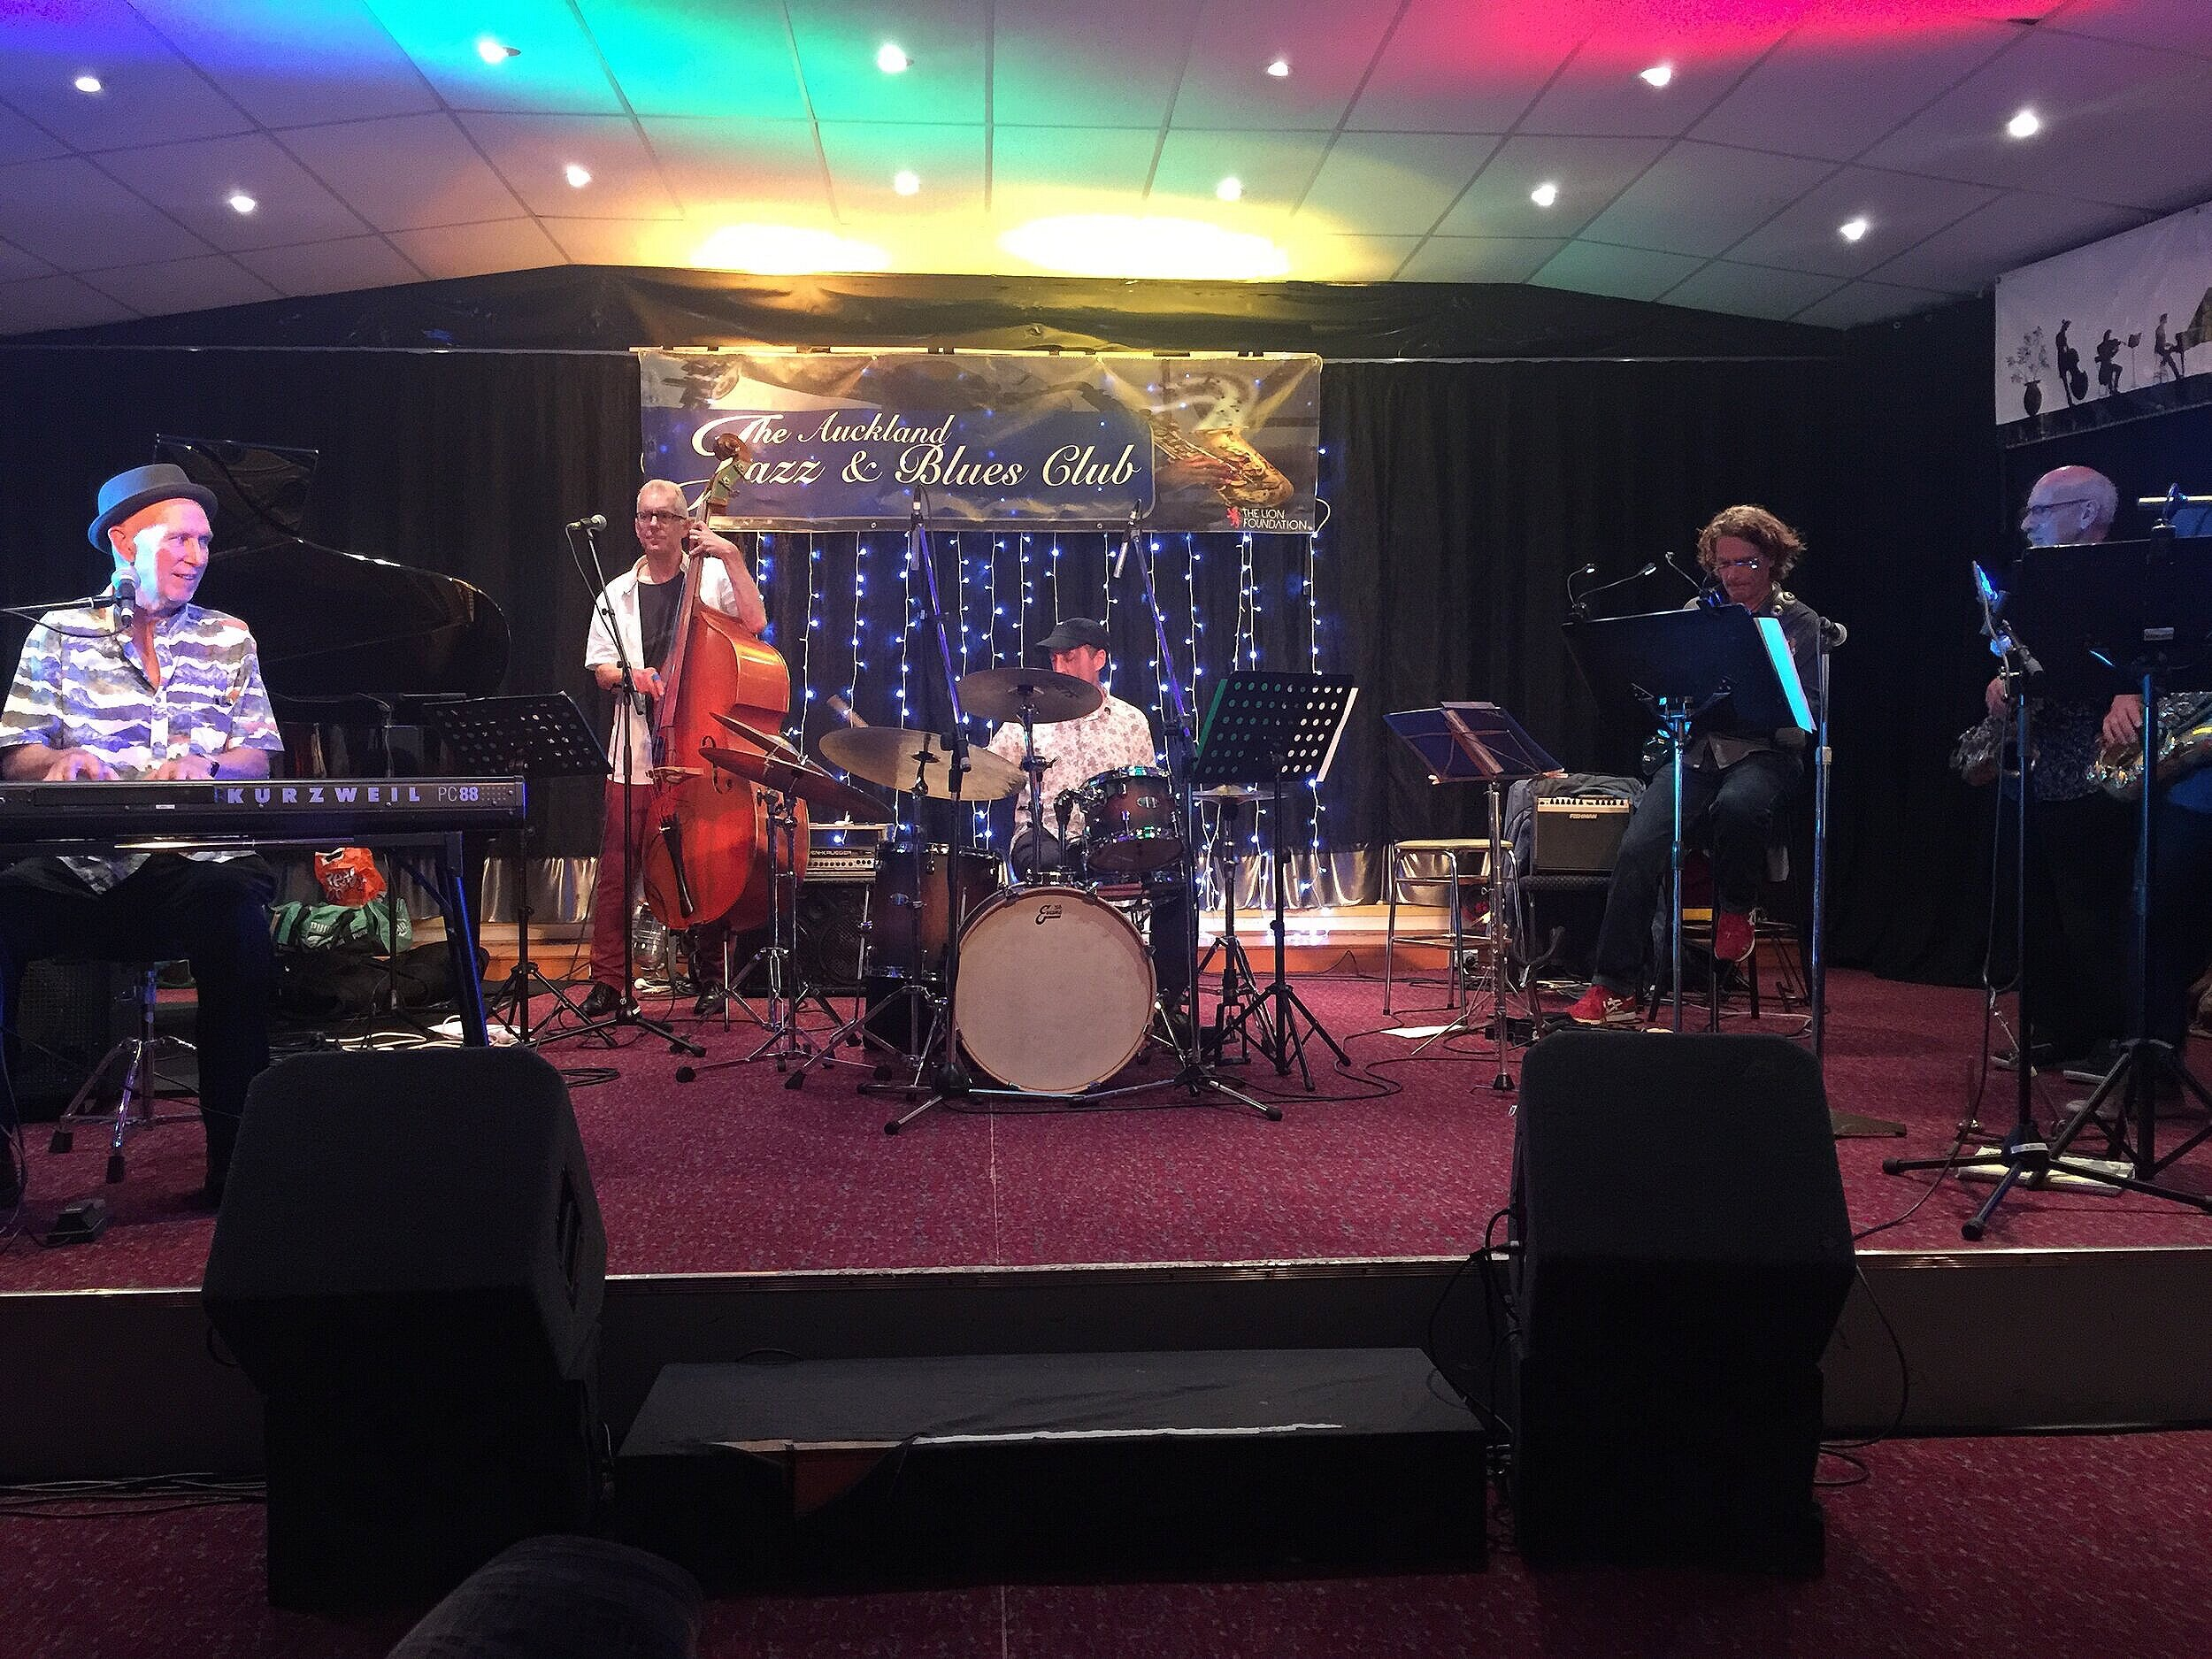 Ross Mullin's band_7-3-17